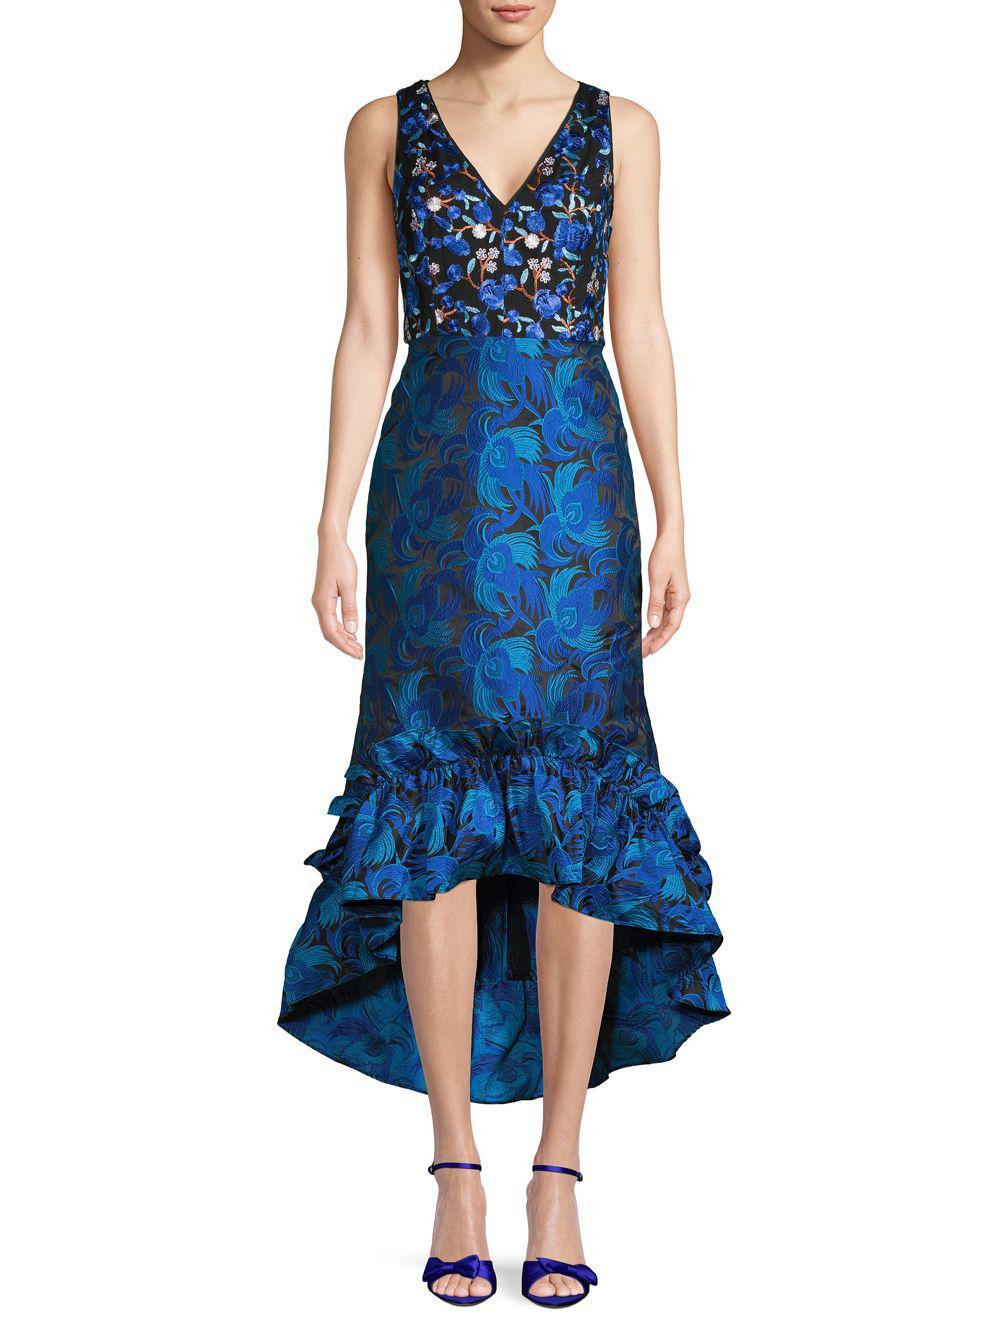 71efc917 Belle By Badgley Mischka. Women's Blue Sandrine Embroidered Floral High-low  Sheath Dress